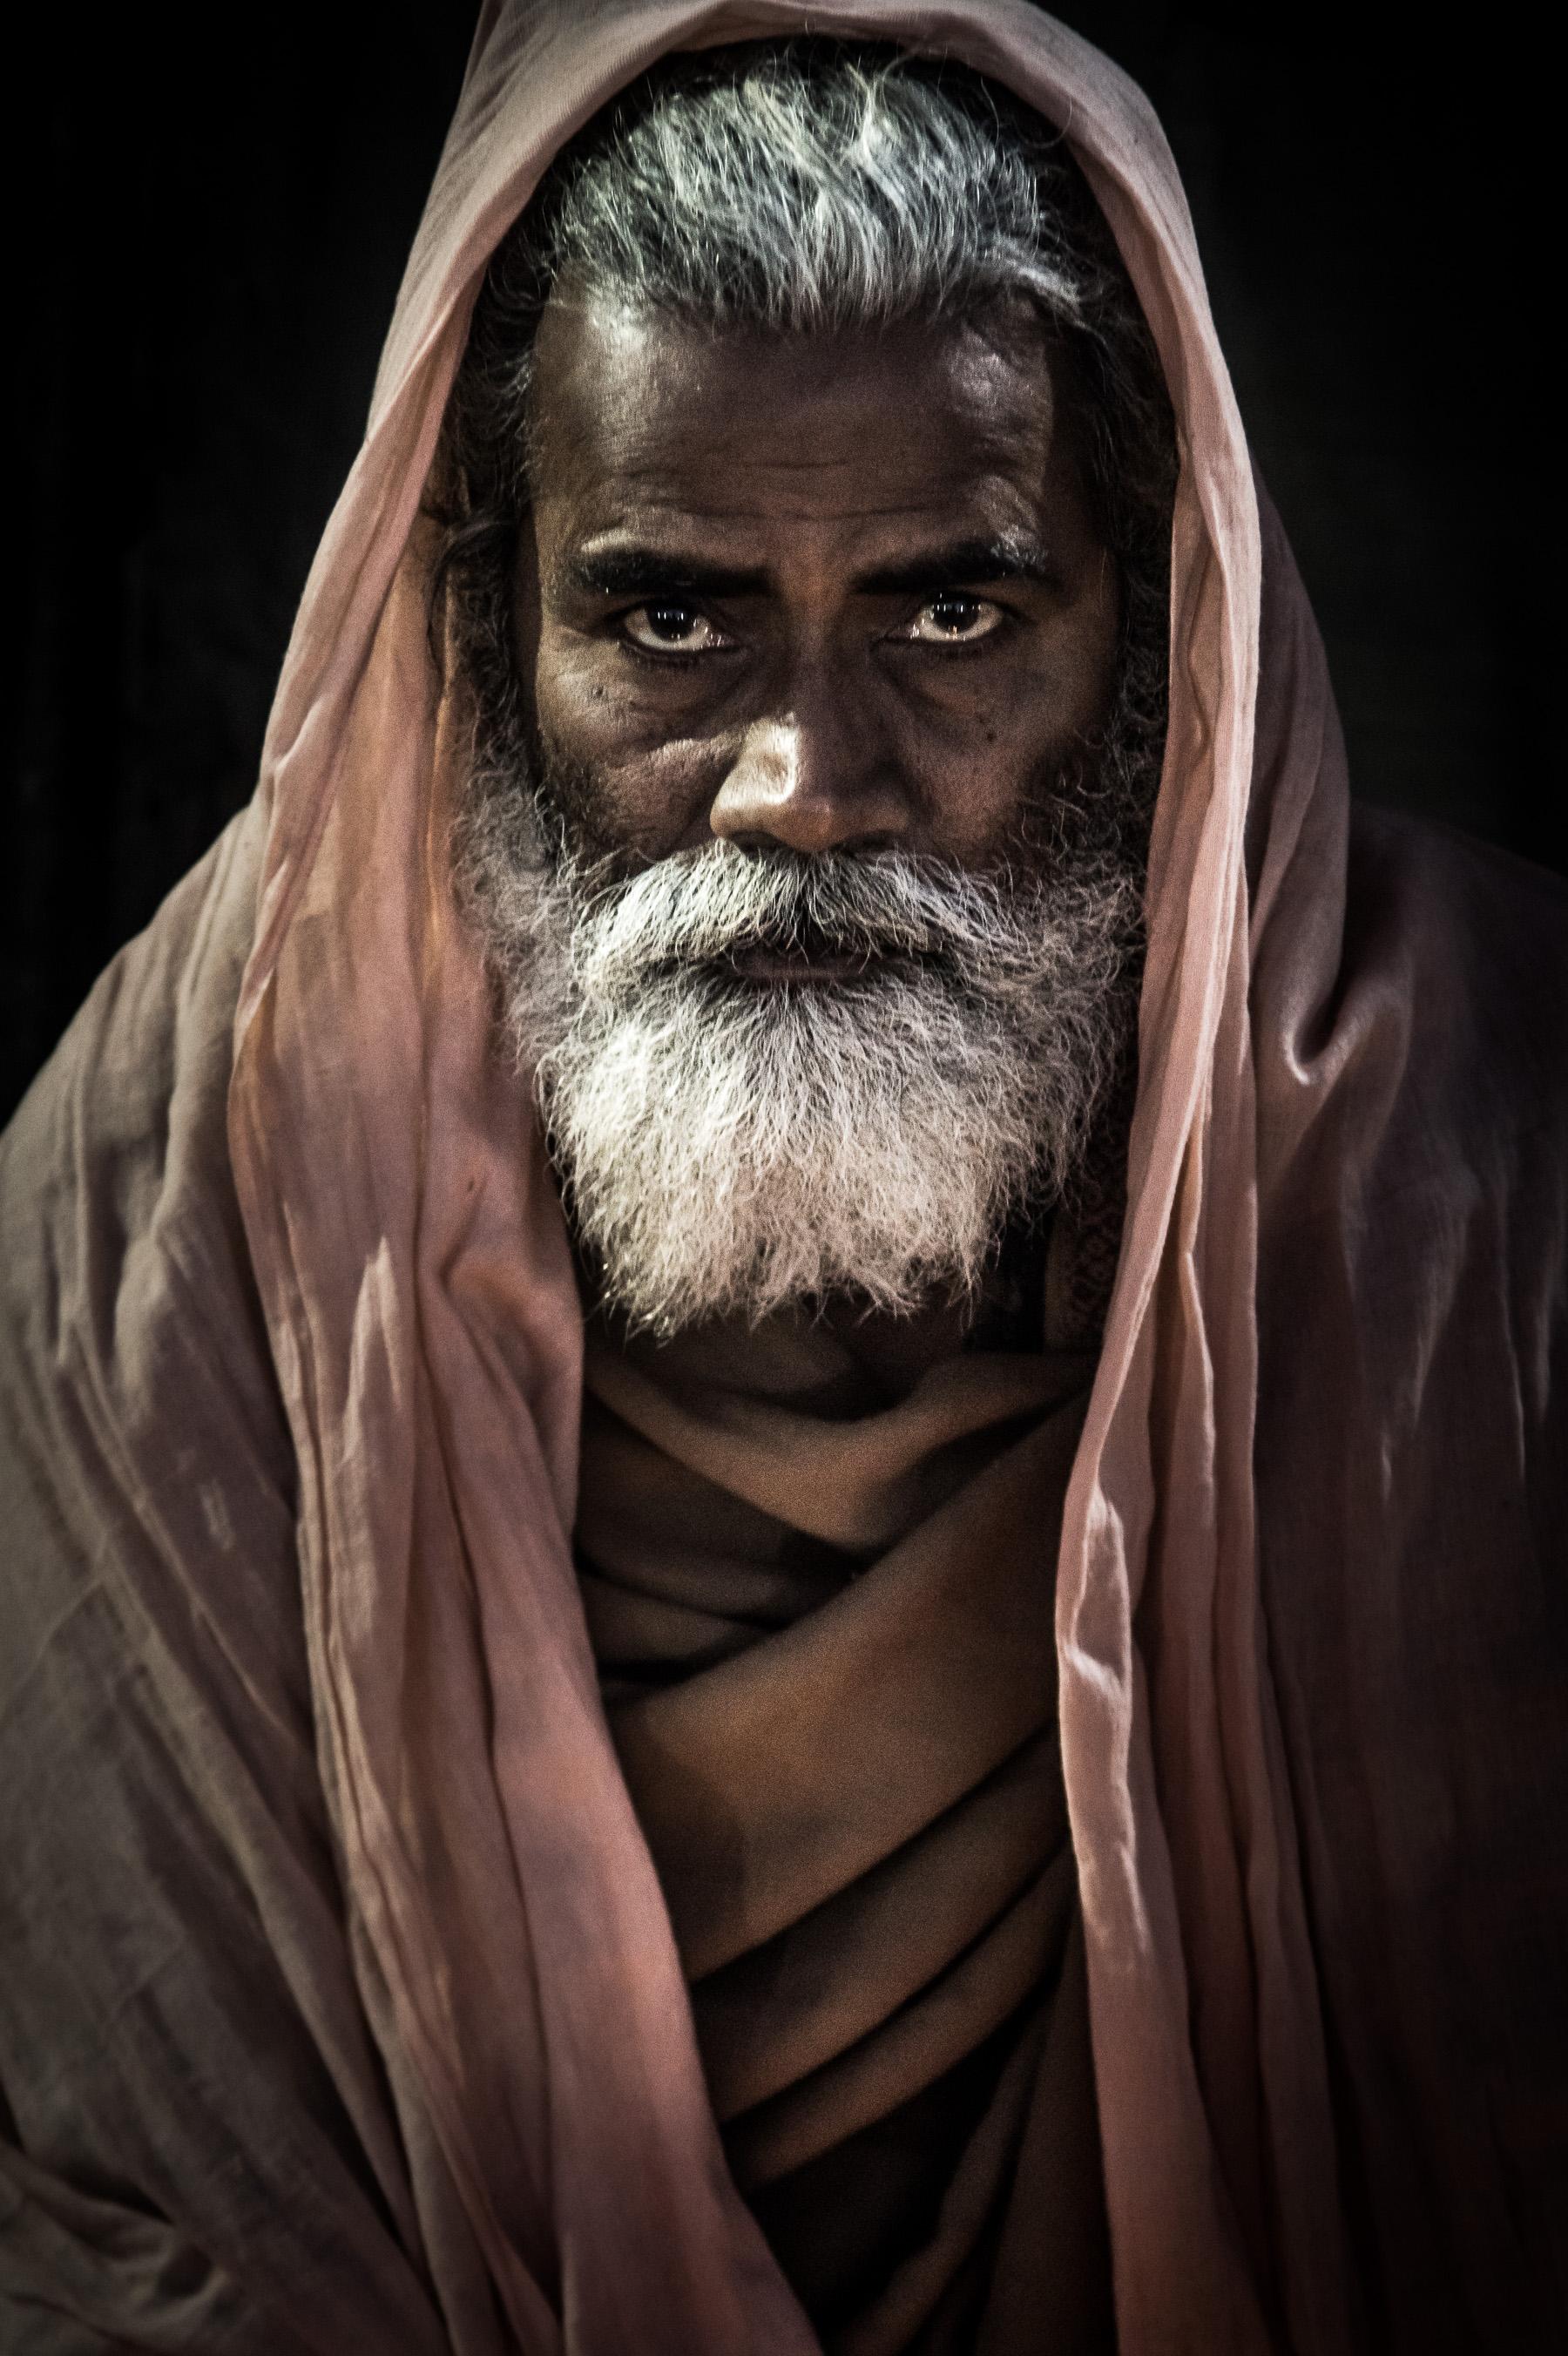 La Kumbha Mela de Prayagraj 2019 en Inde par Alexandre Sattler